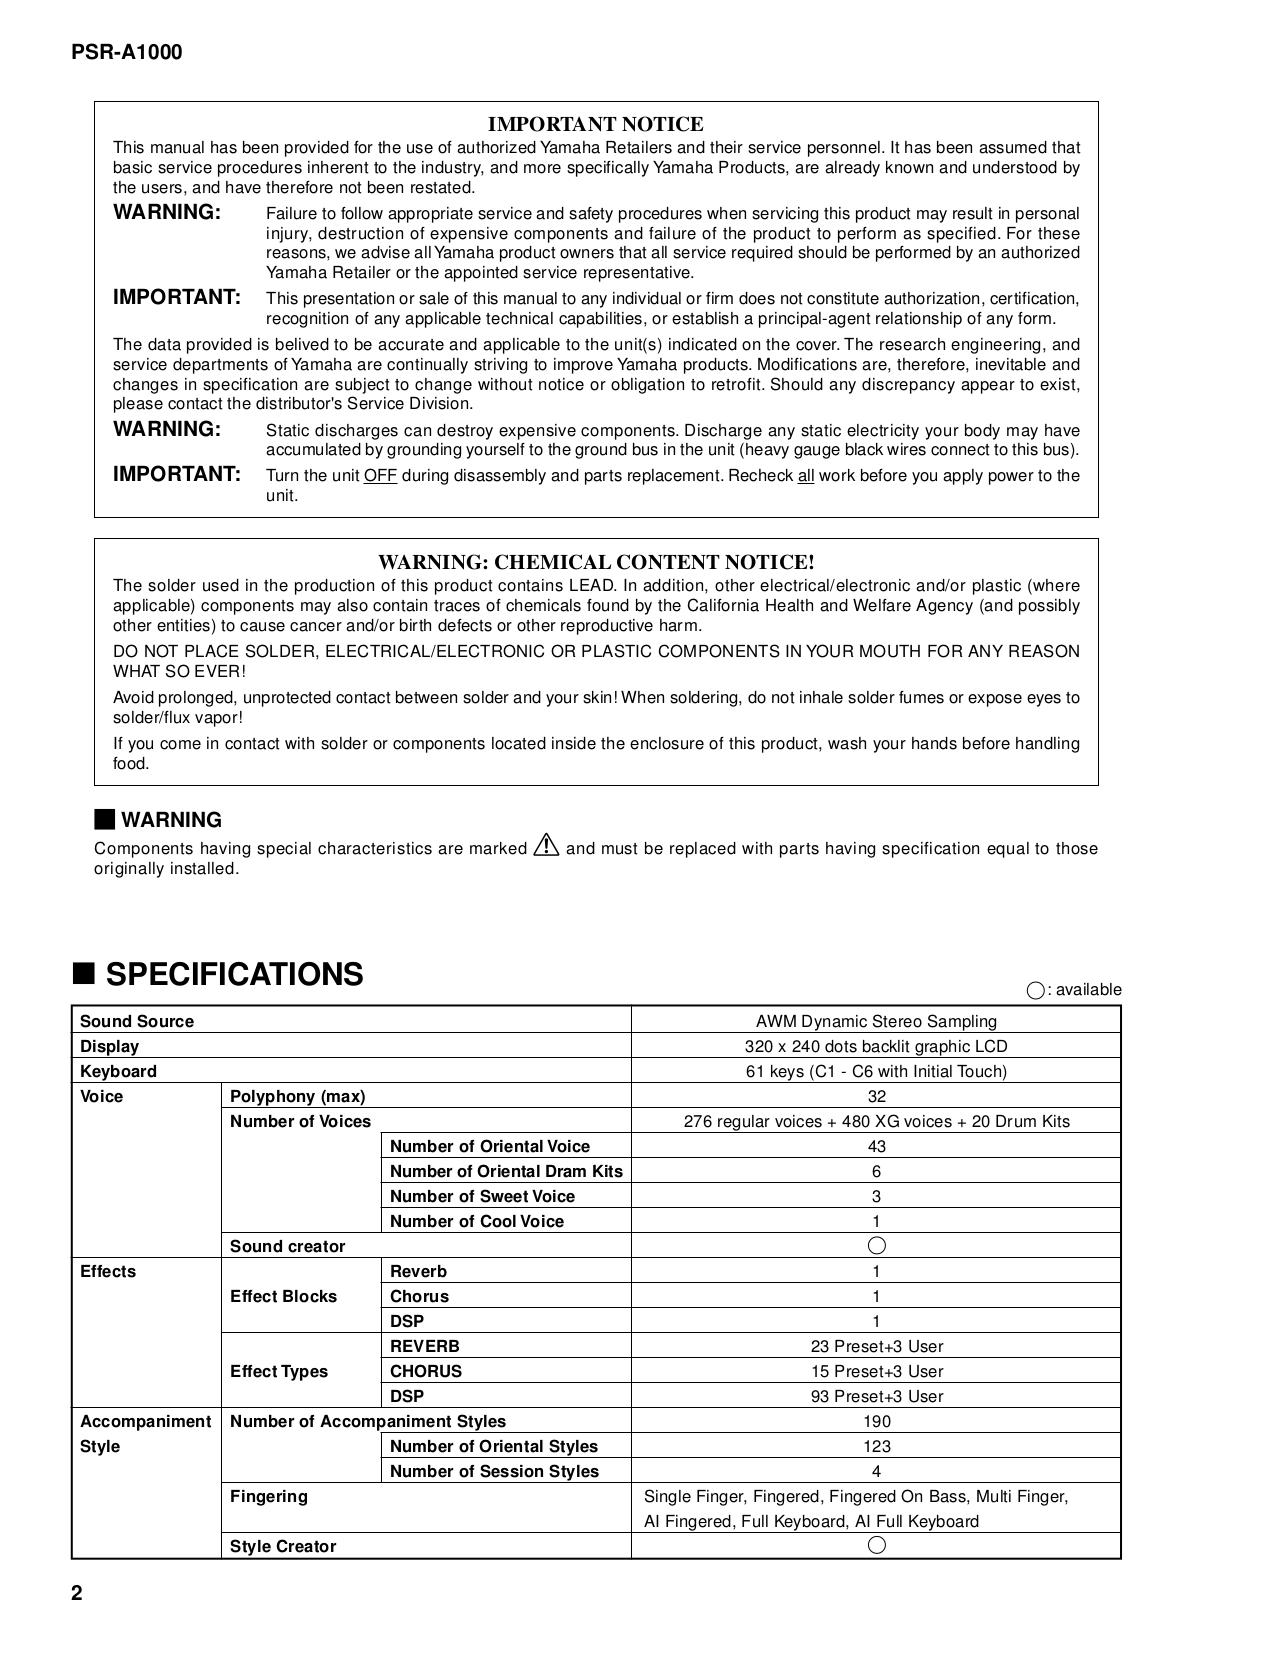 Adobe Pagemaker 7 0 manual free